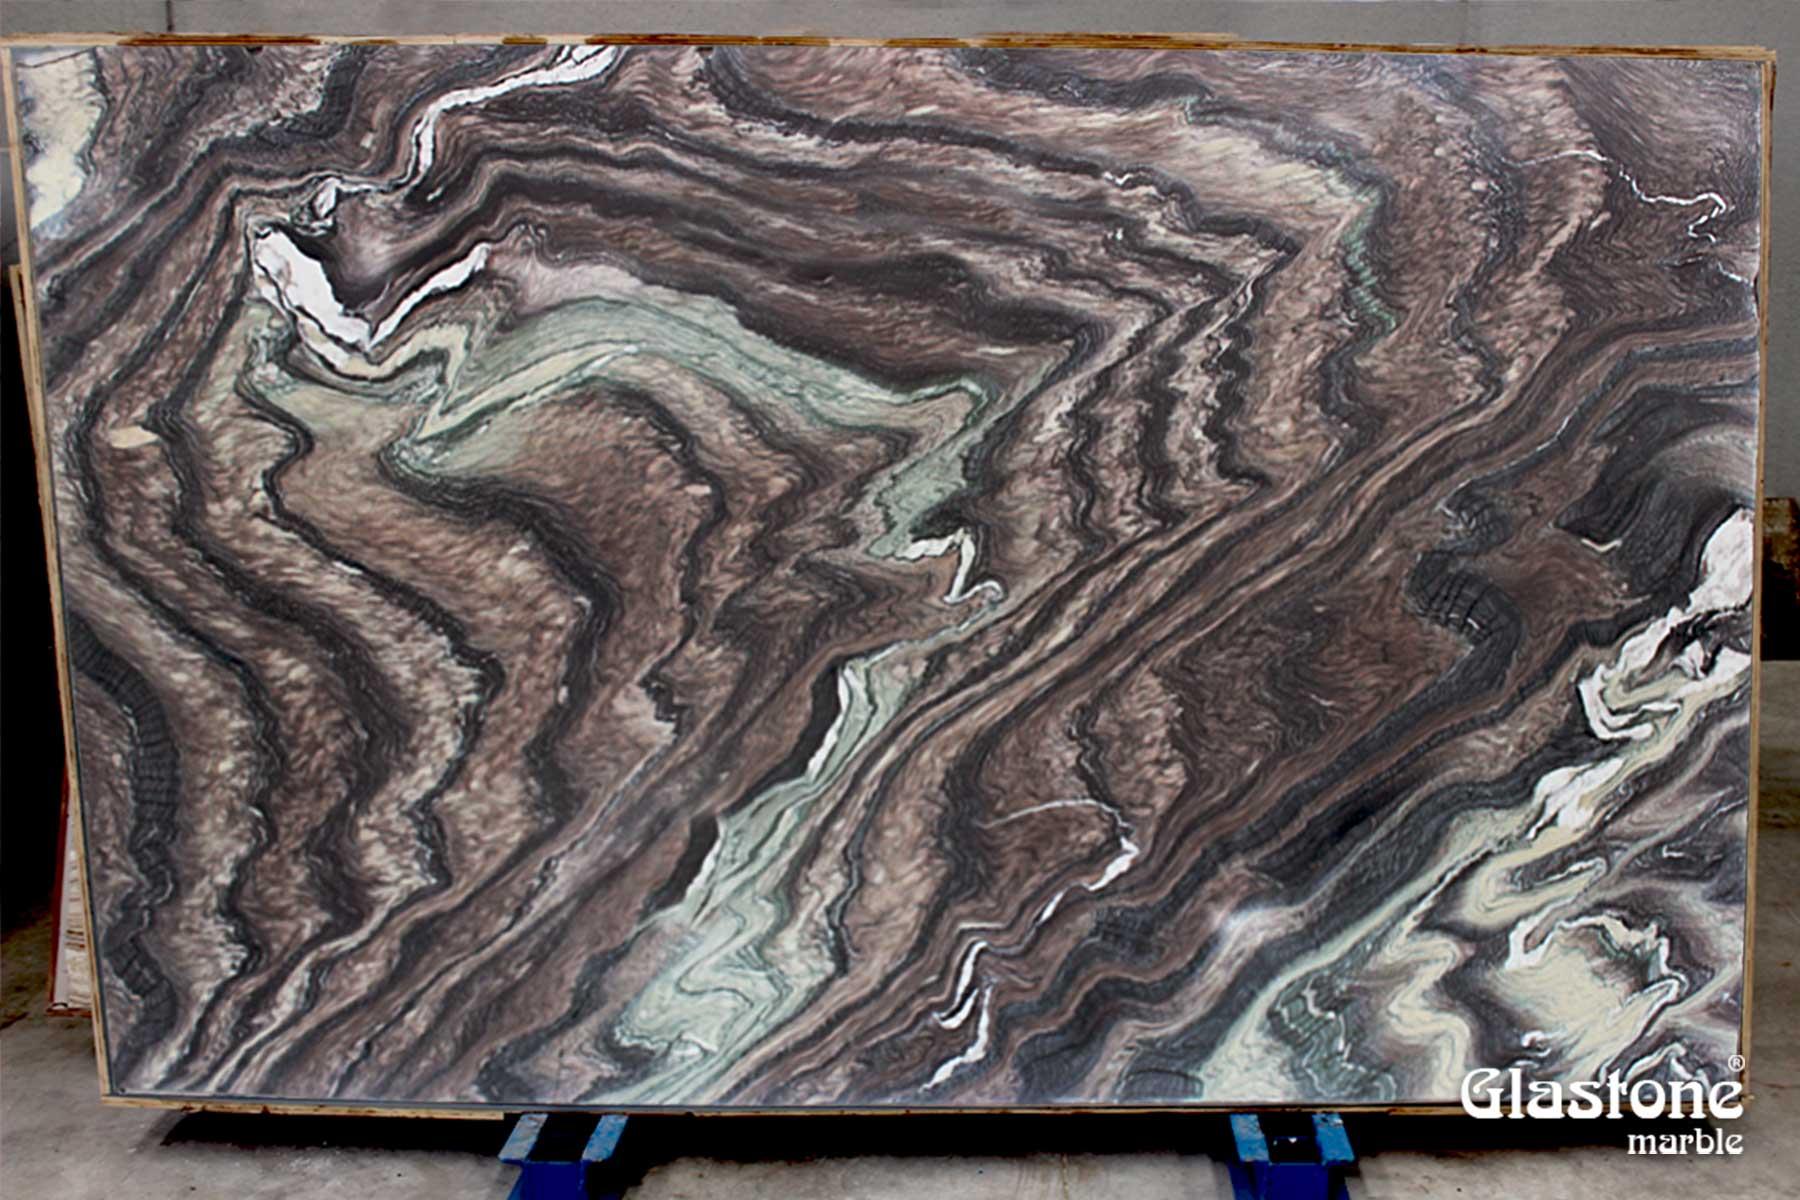 glastone marble marmol solerialaminado vidrio marmol natural cipollino ondulato rosso